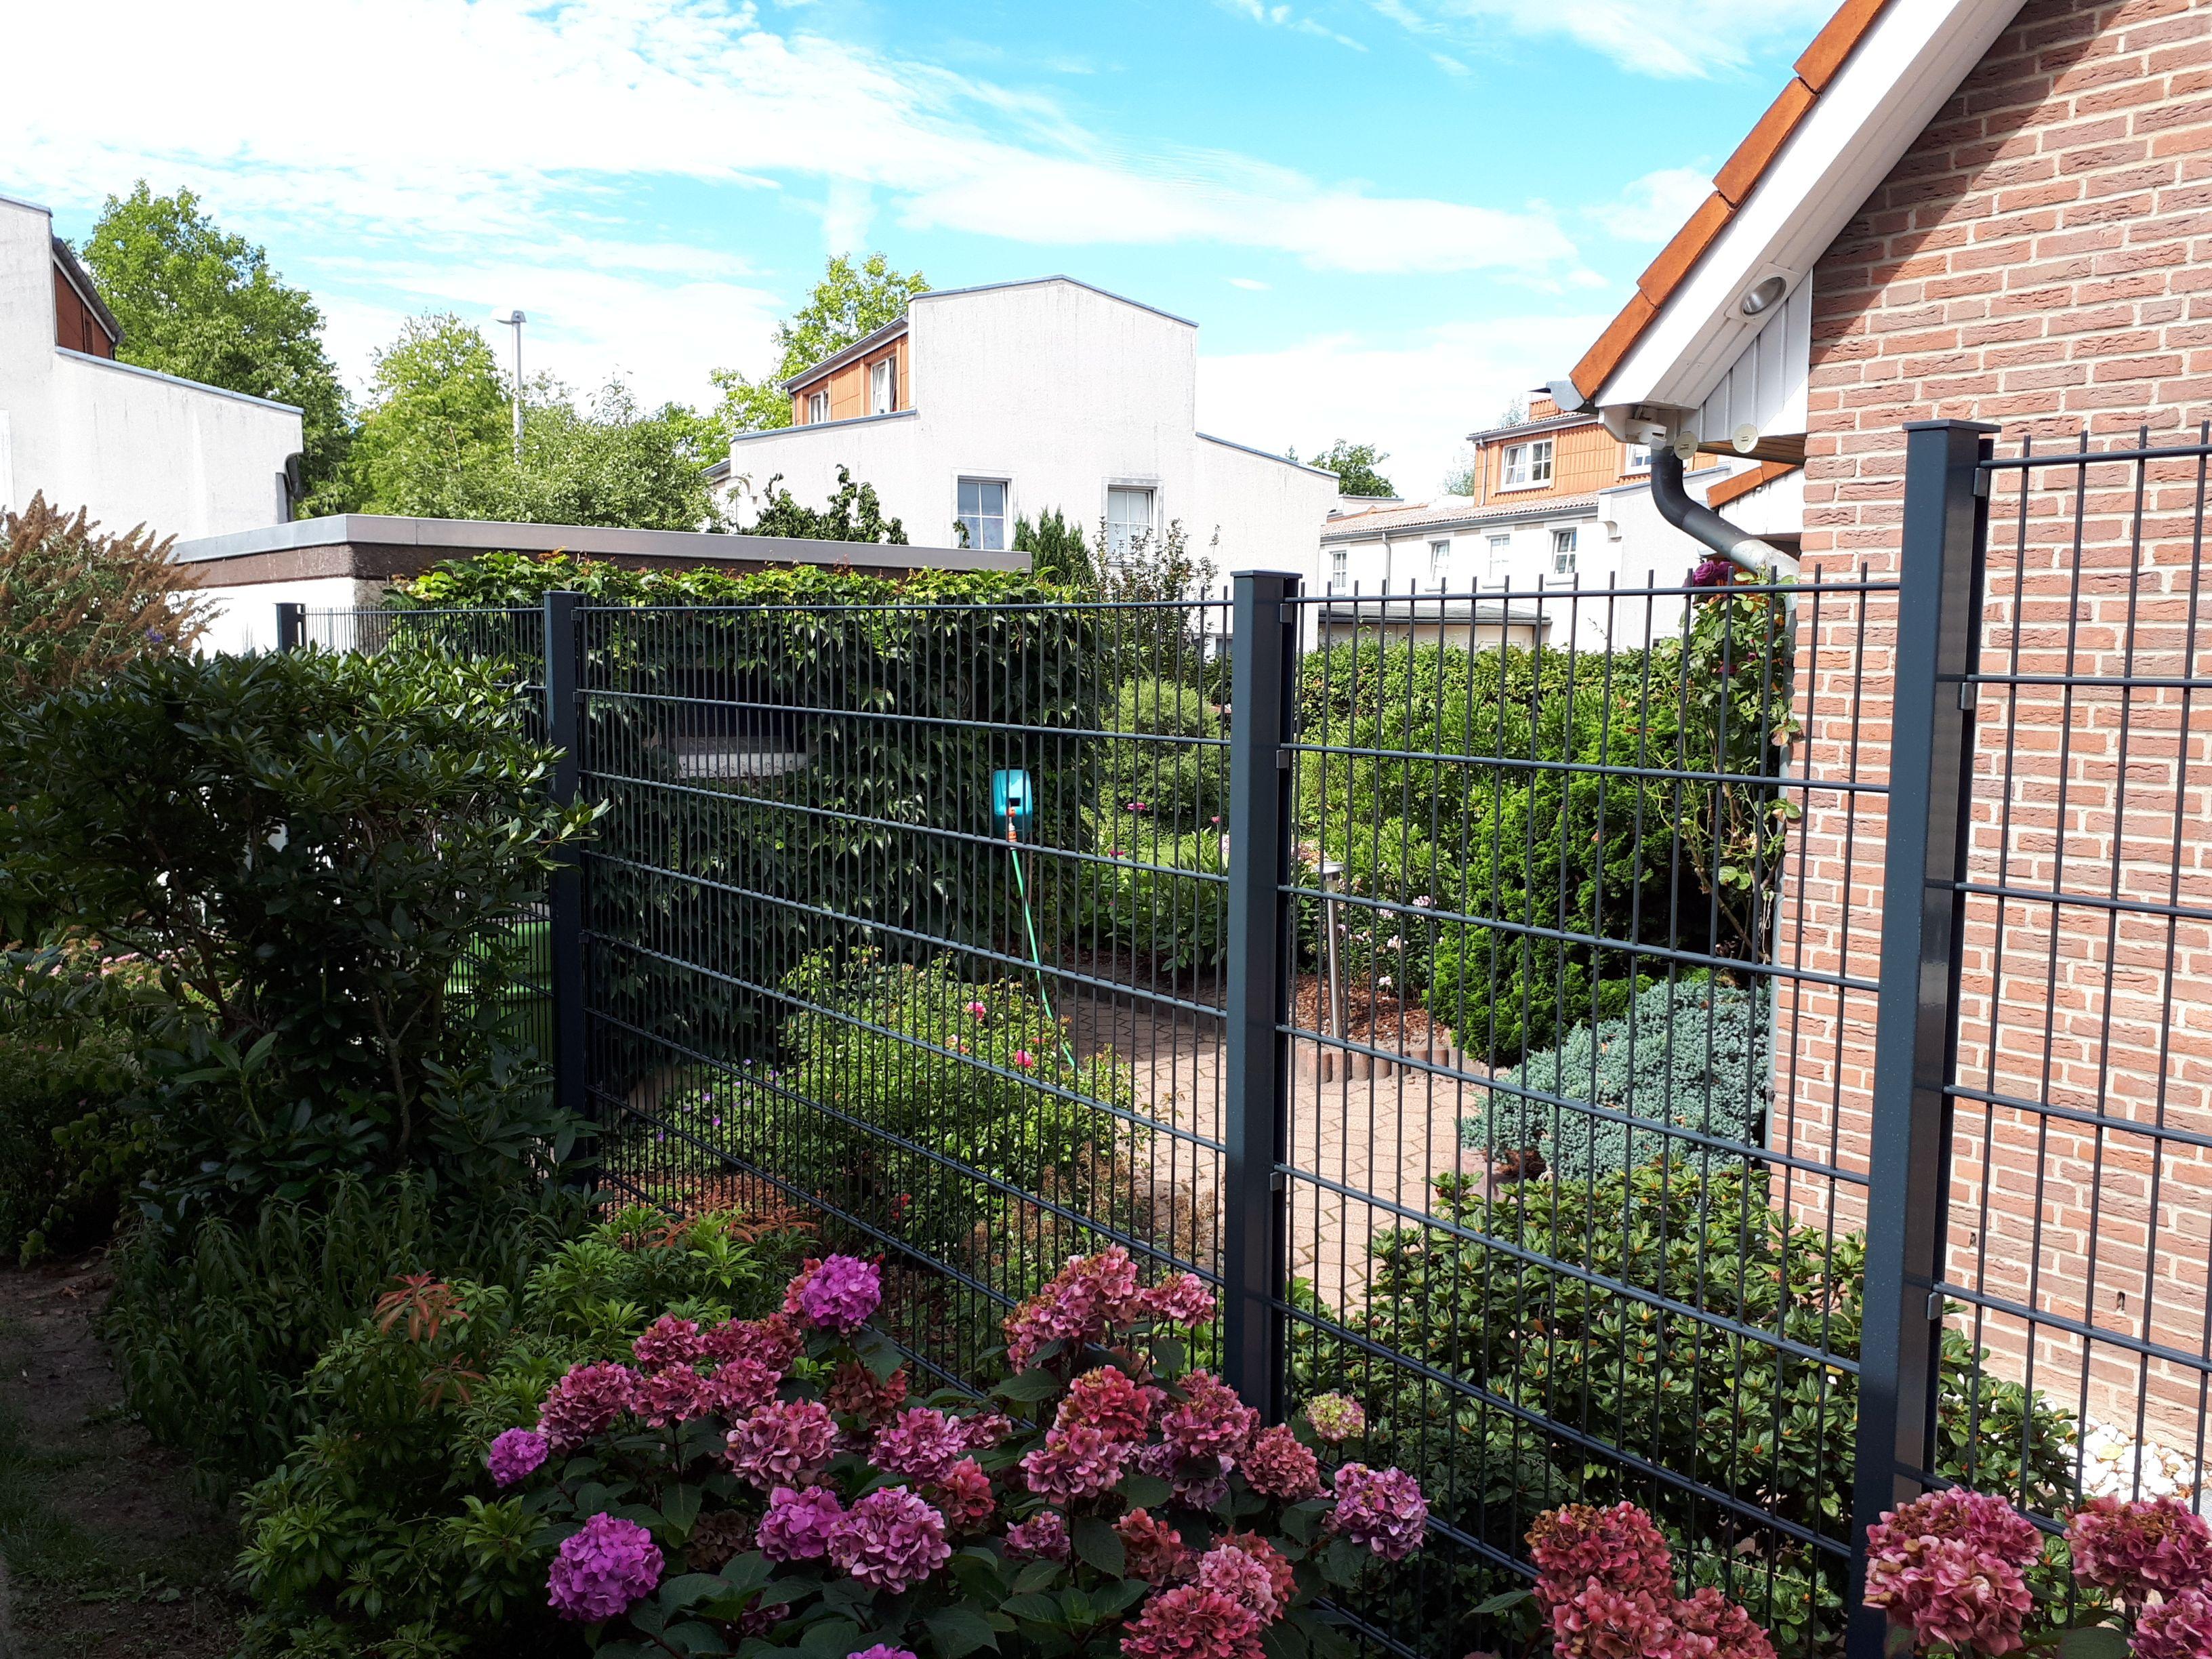 Bau Eines Doppelstabmattenzaunes Zaunbau Doppelstabmattenzaun Zaun